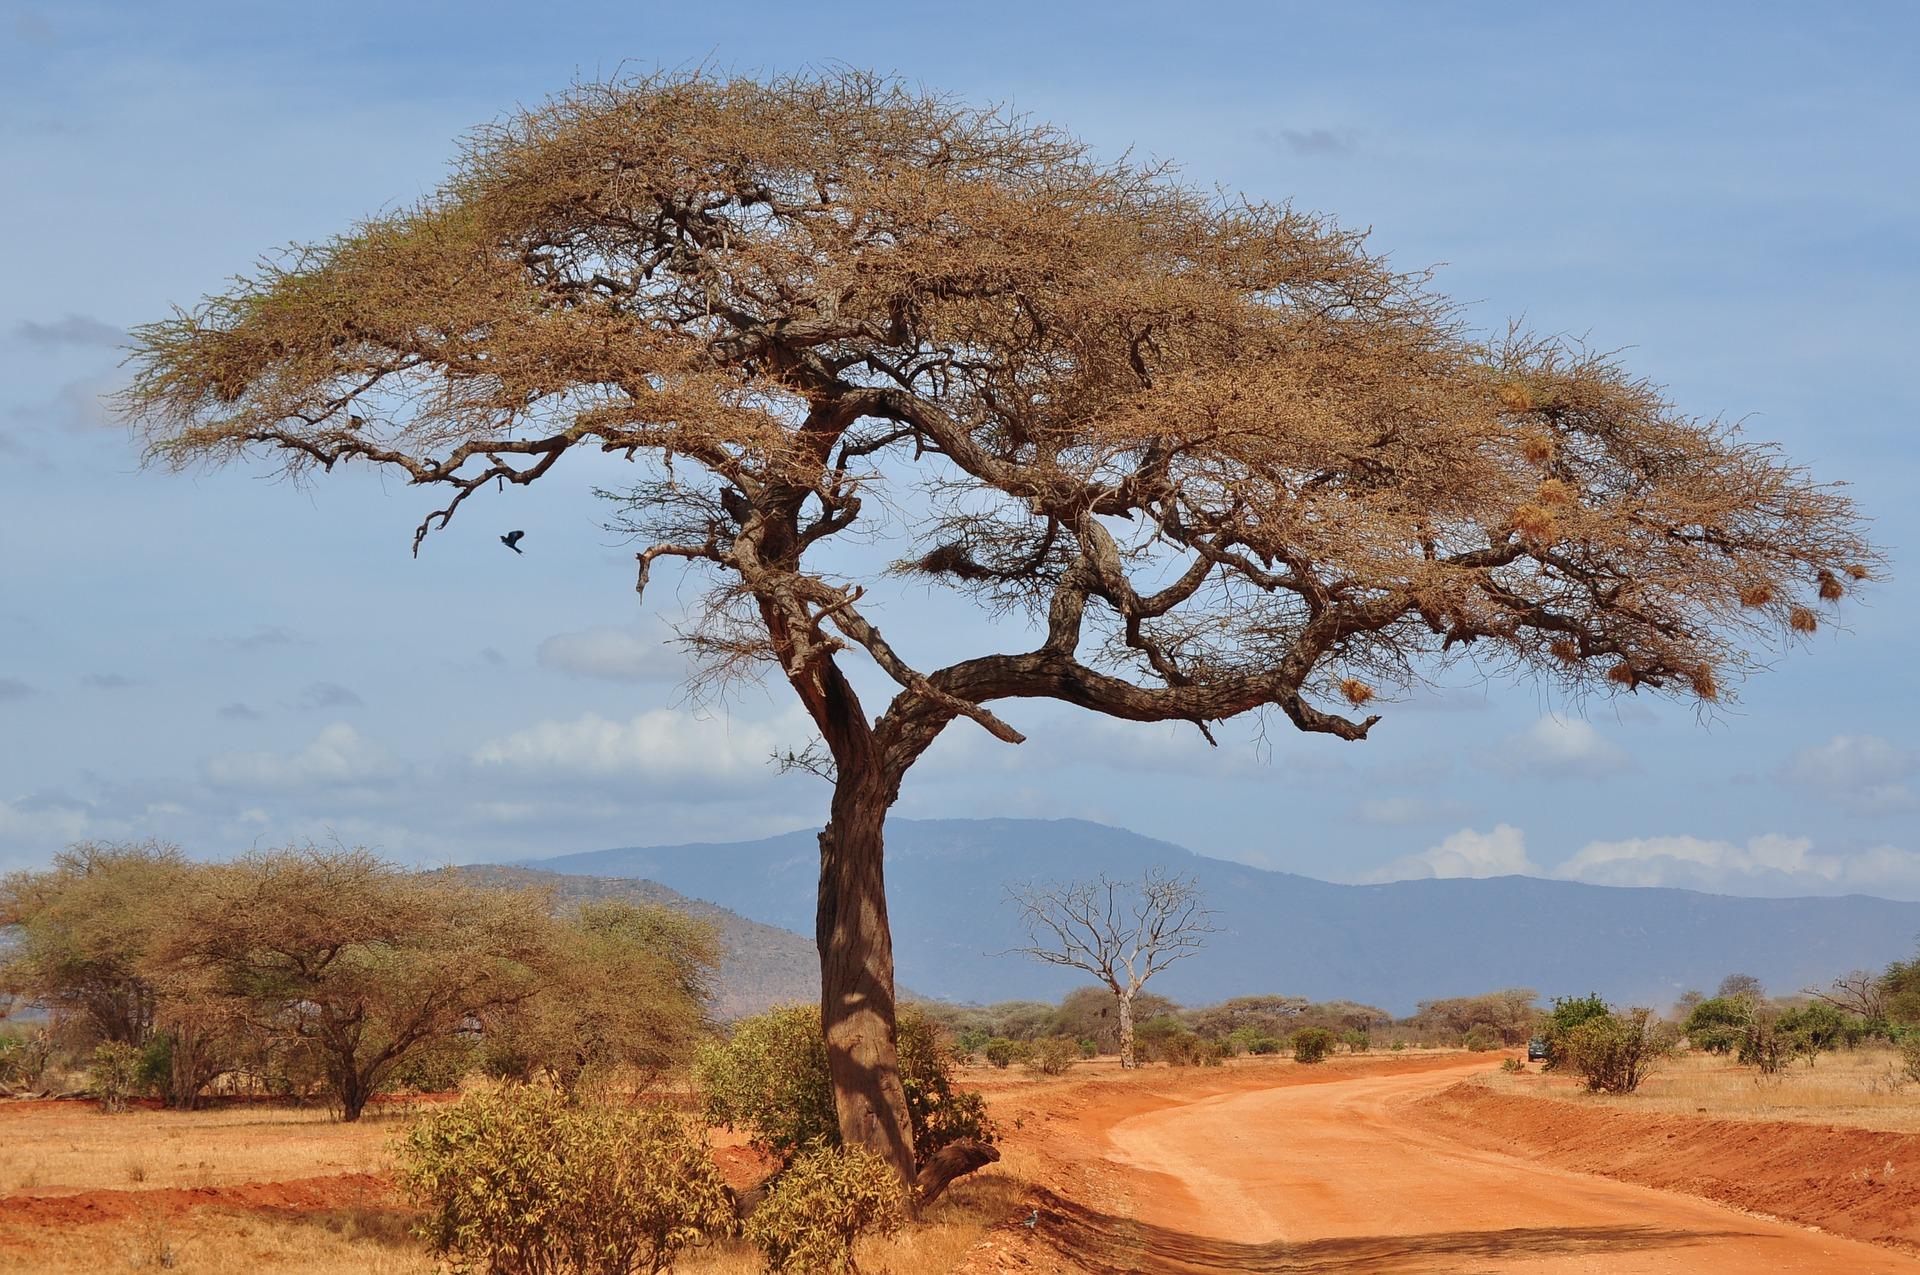 Image of the Nigerian landscape